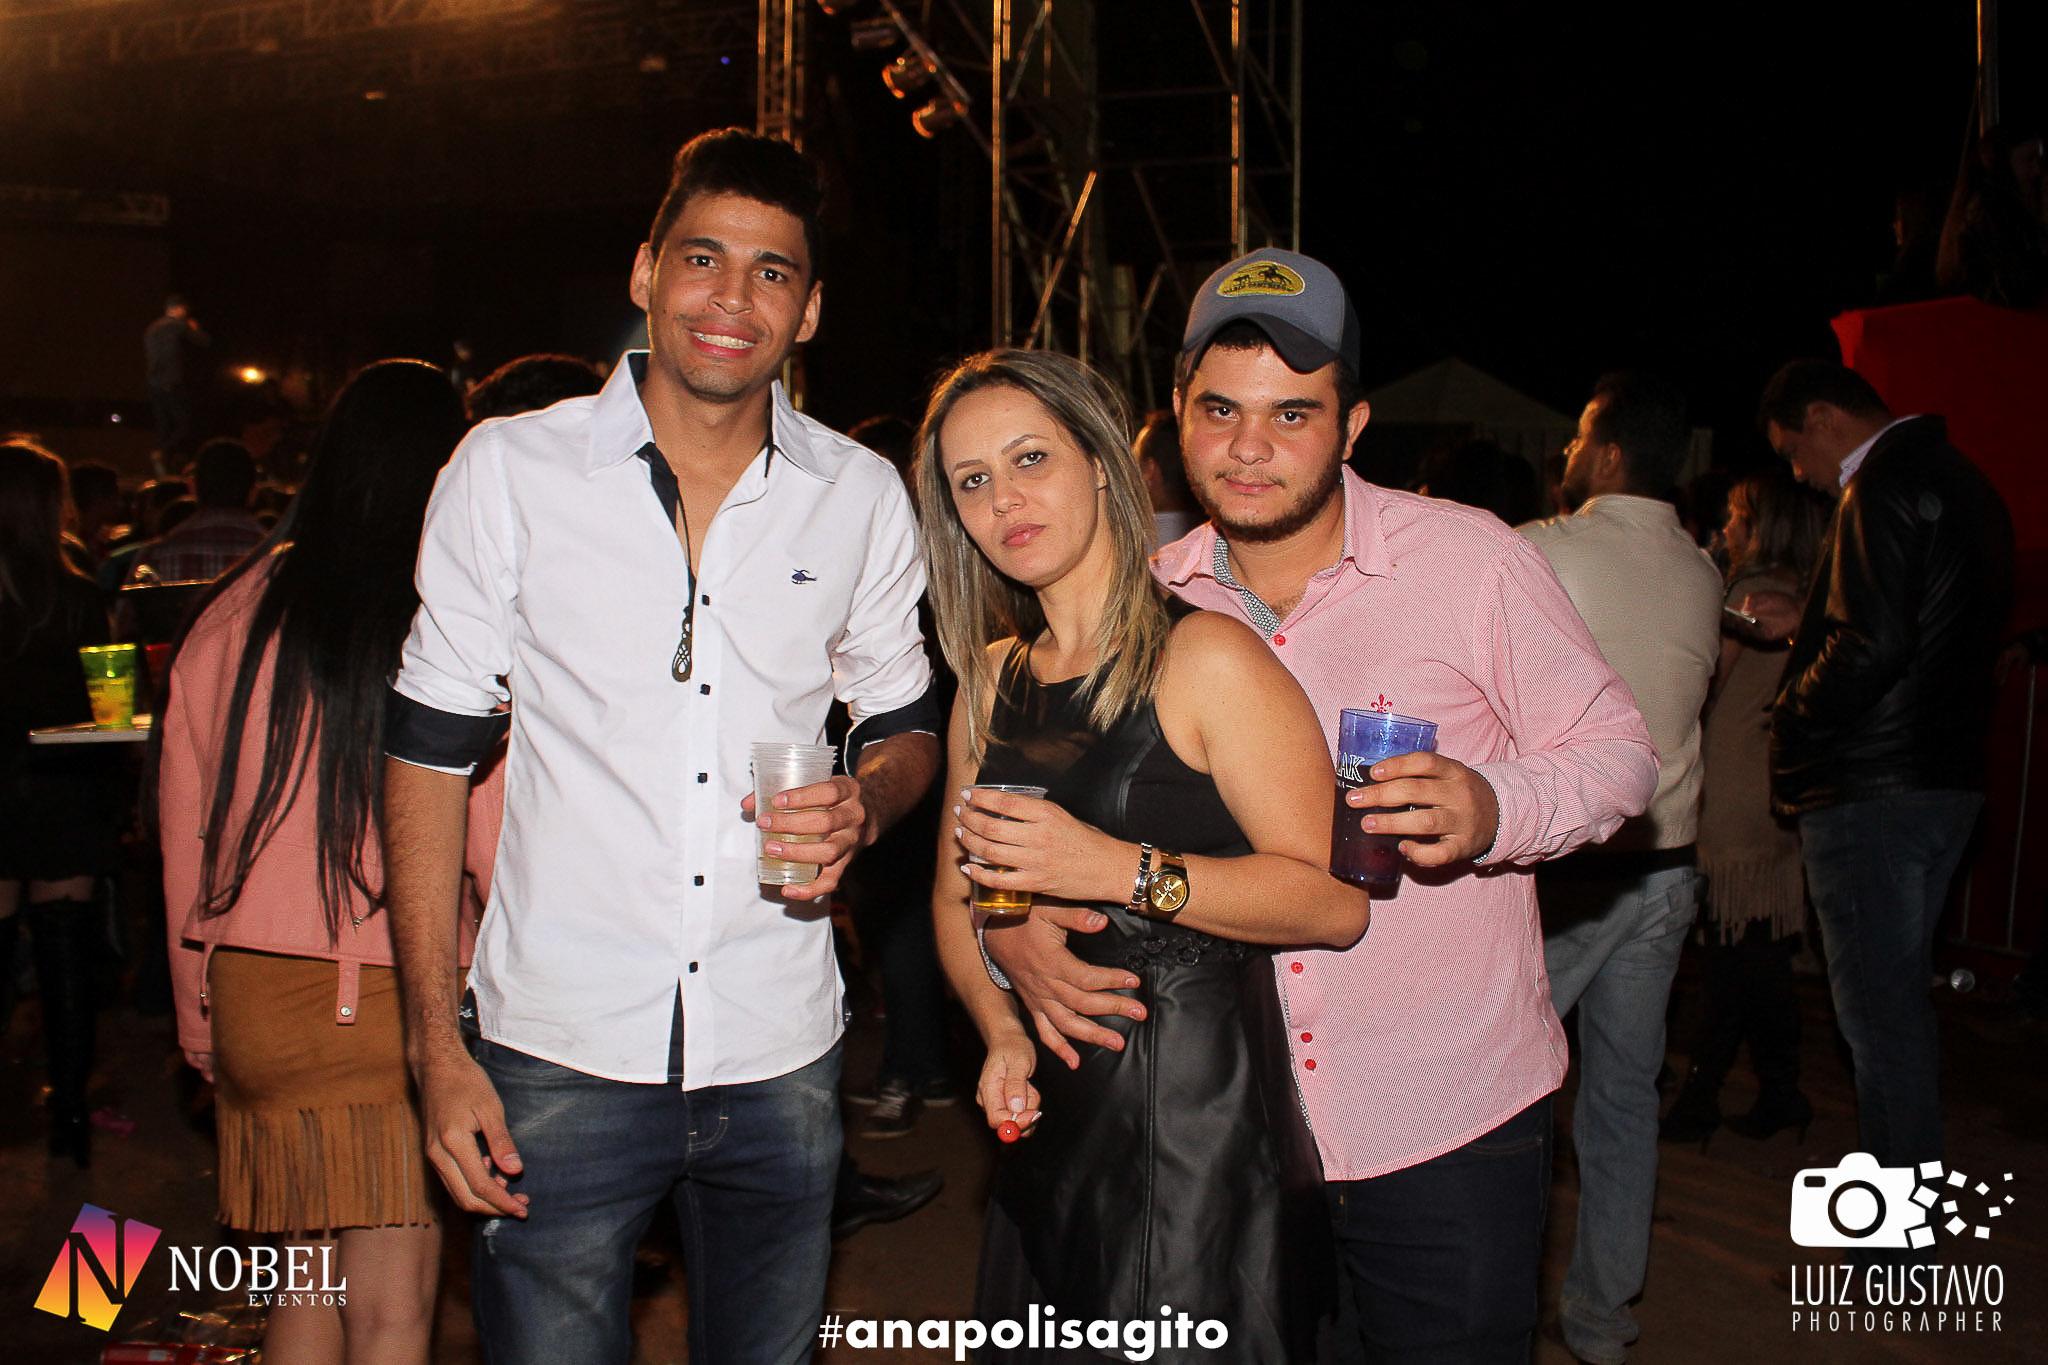 Luiz Gustavo Photographer-146